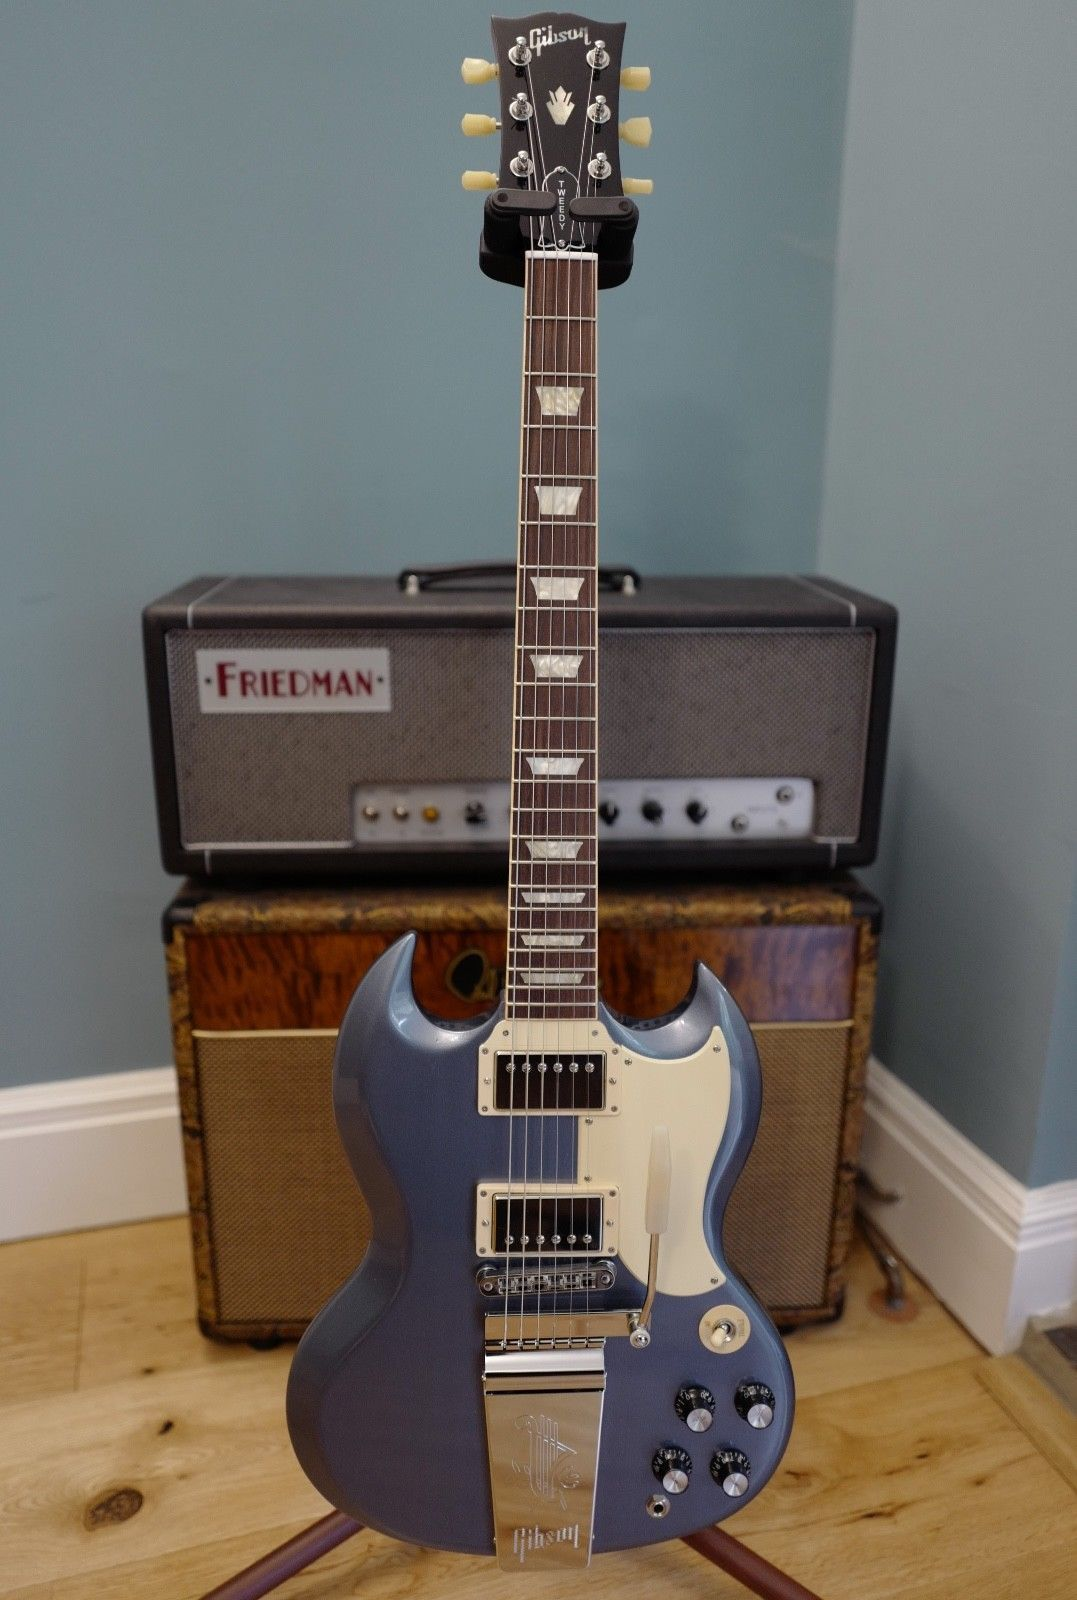 Gibson Sg Jeff Tweedy Signature 61 Wilco Tools Of The Gods